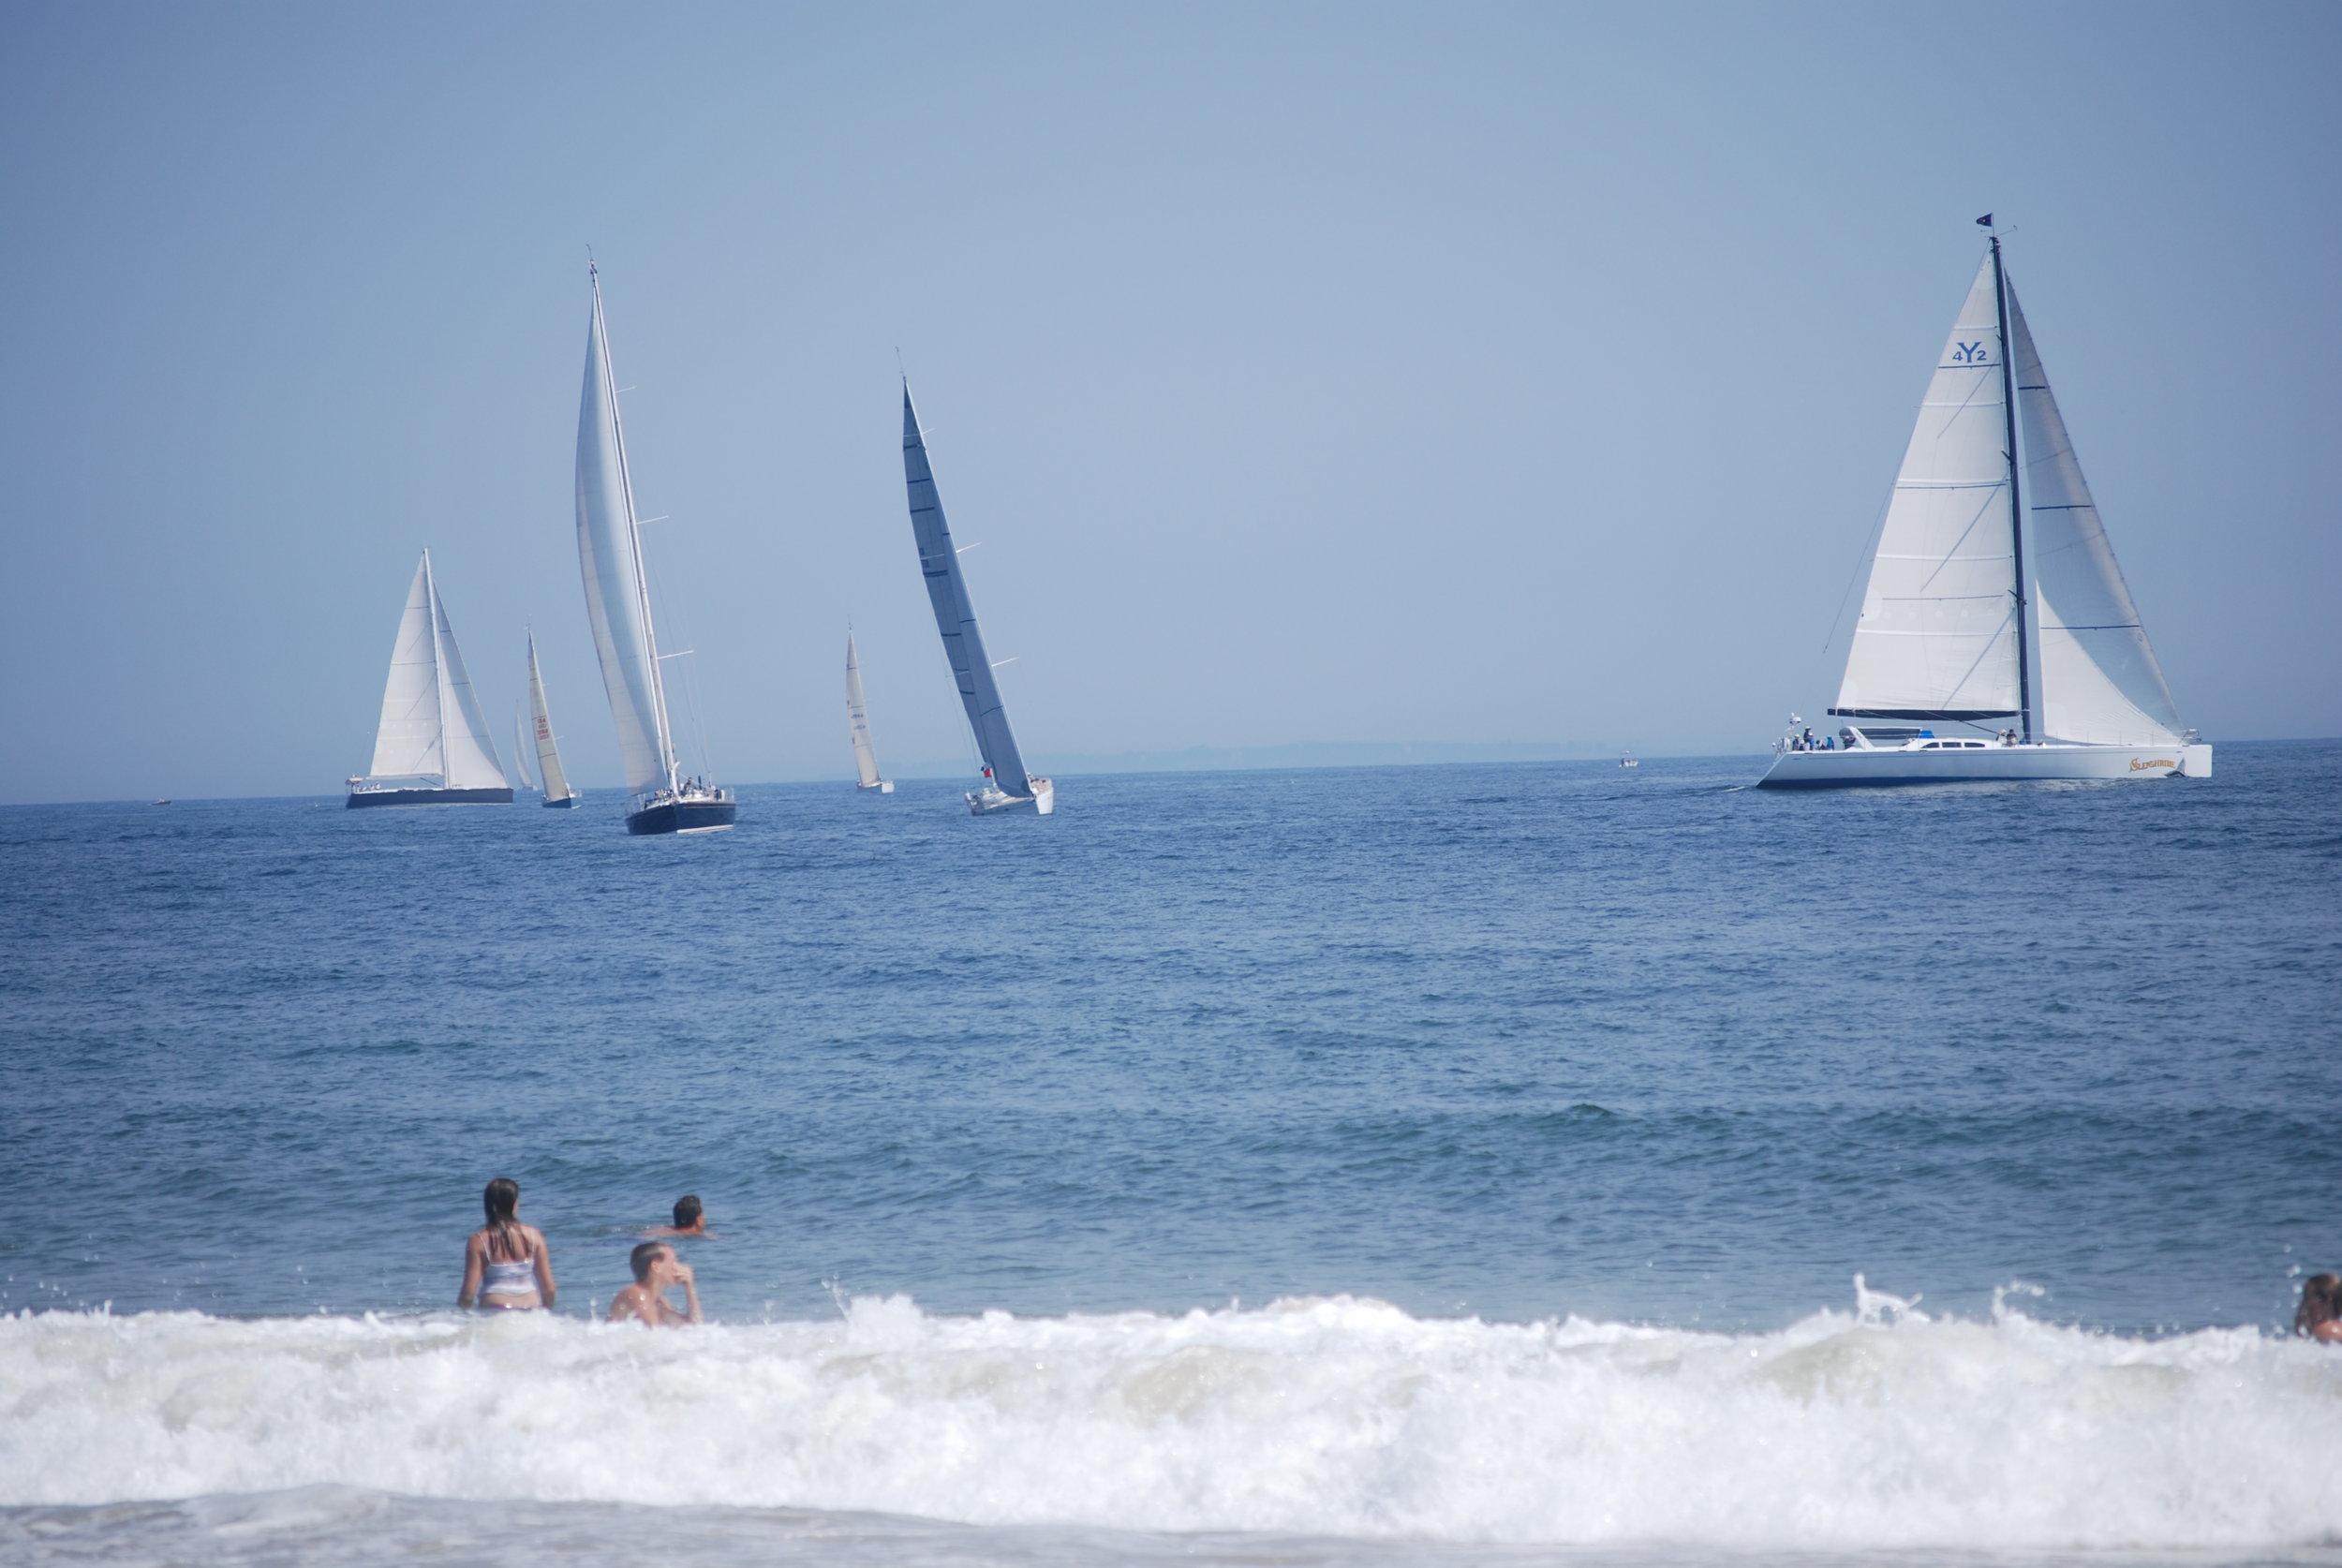 Sailboats_off_Westerly,_RI_coast.JPG